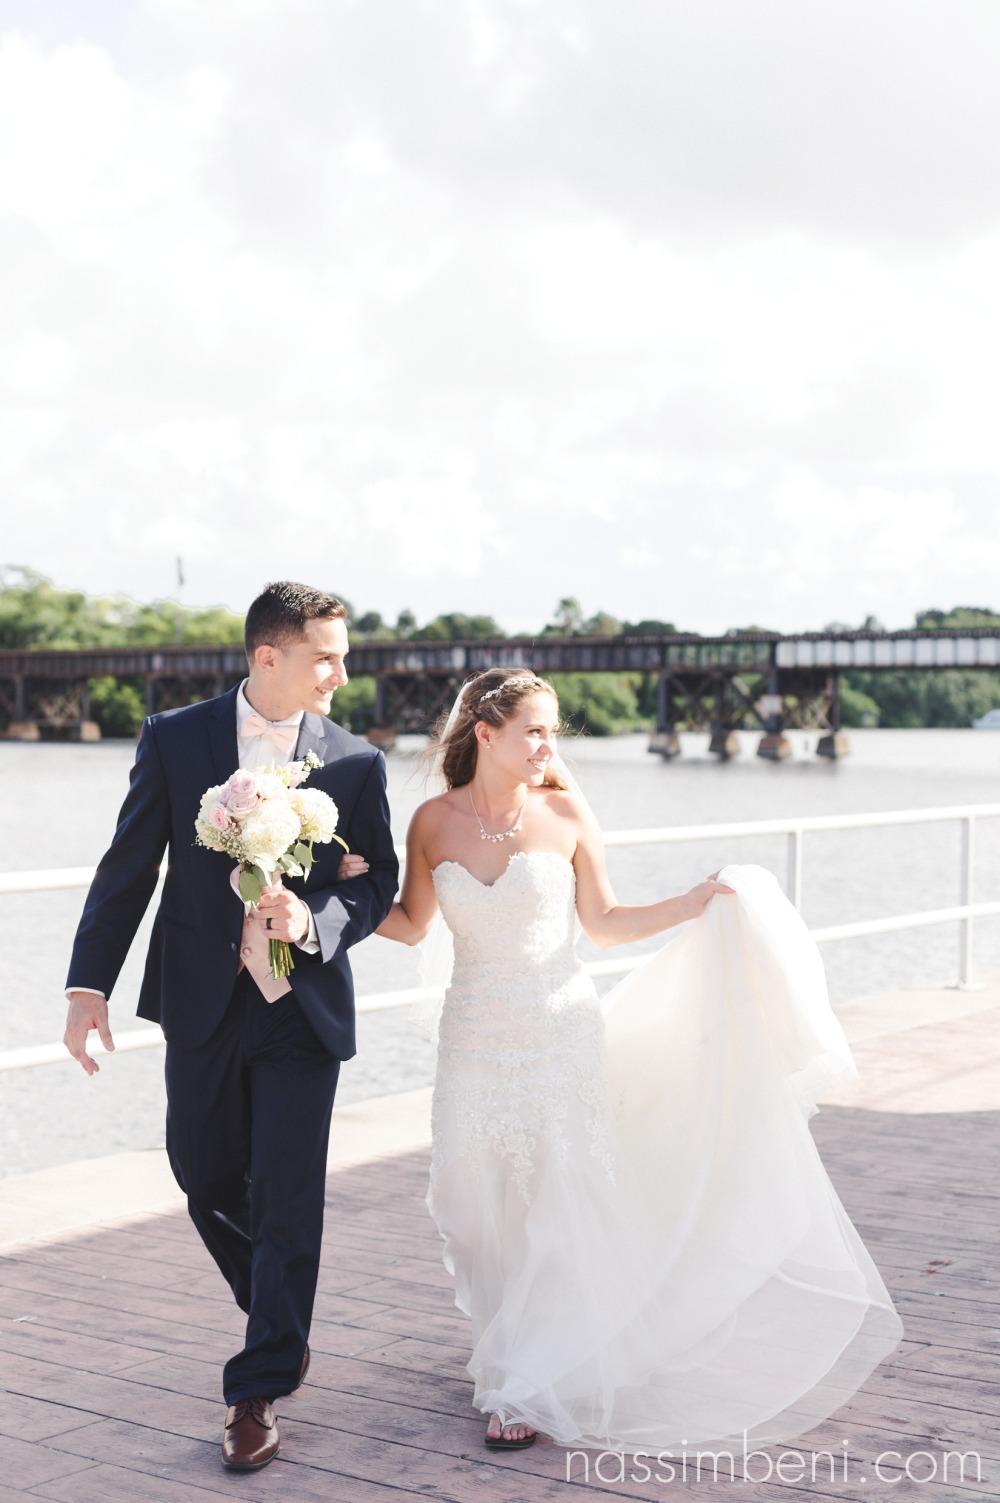 bride and groom infant of more love train bridge at crane creek promenade park by nasimbeni photography